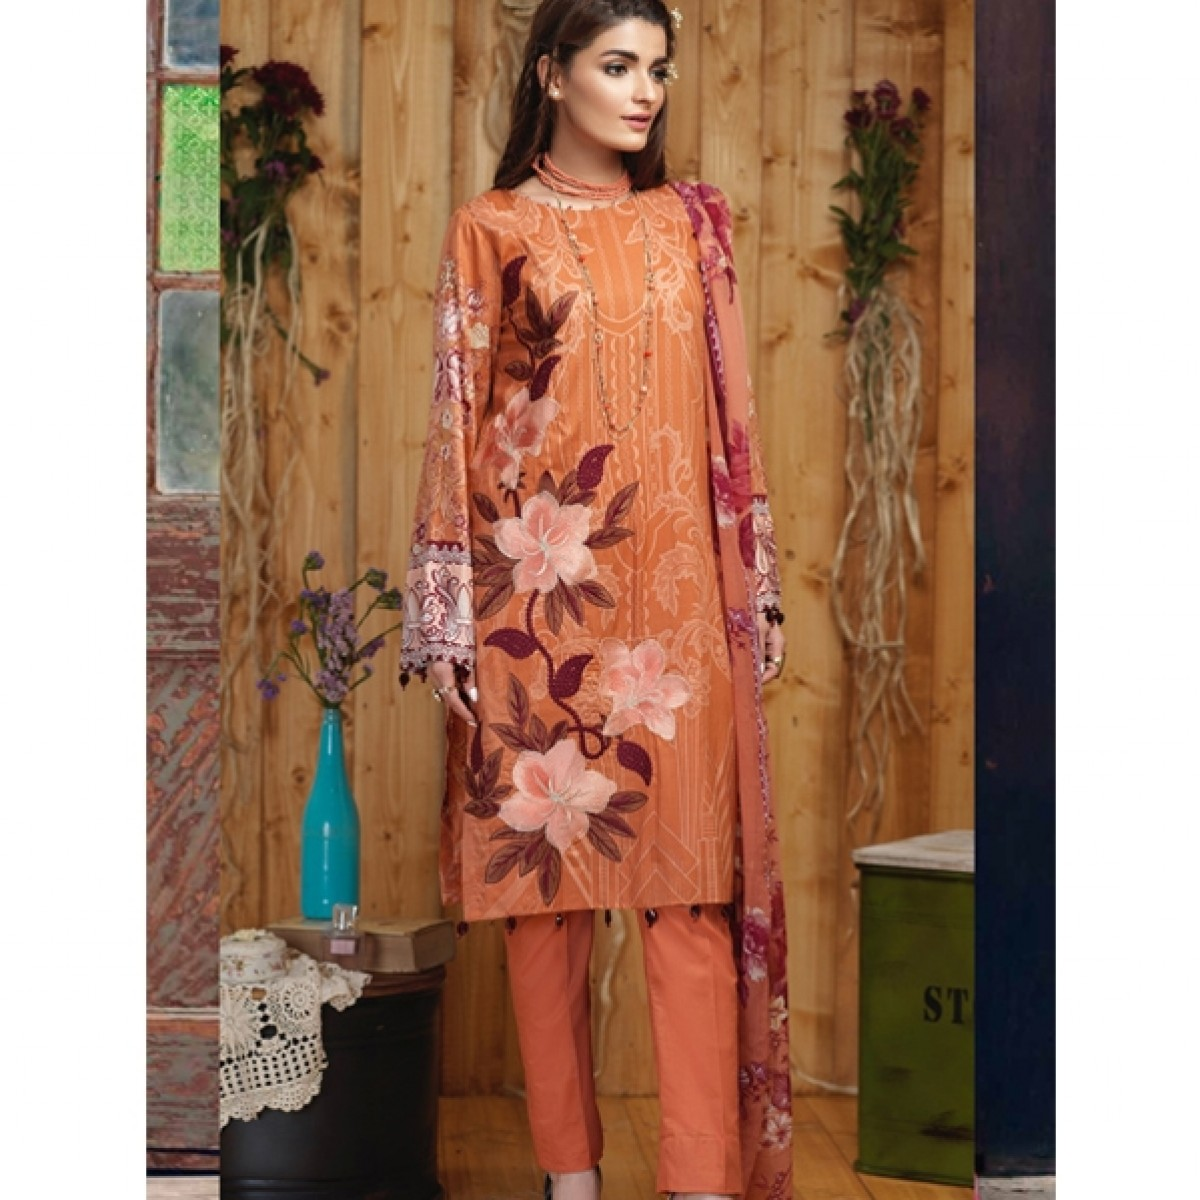 9ab0dfaad6 Salitex Silkoria Emb Collection Vol 4 2019 (RC-164B) Price in Pakistan |  Buy Salitex Silkoria Lawn Collection 3 Piece | iShopping.pk